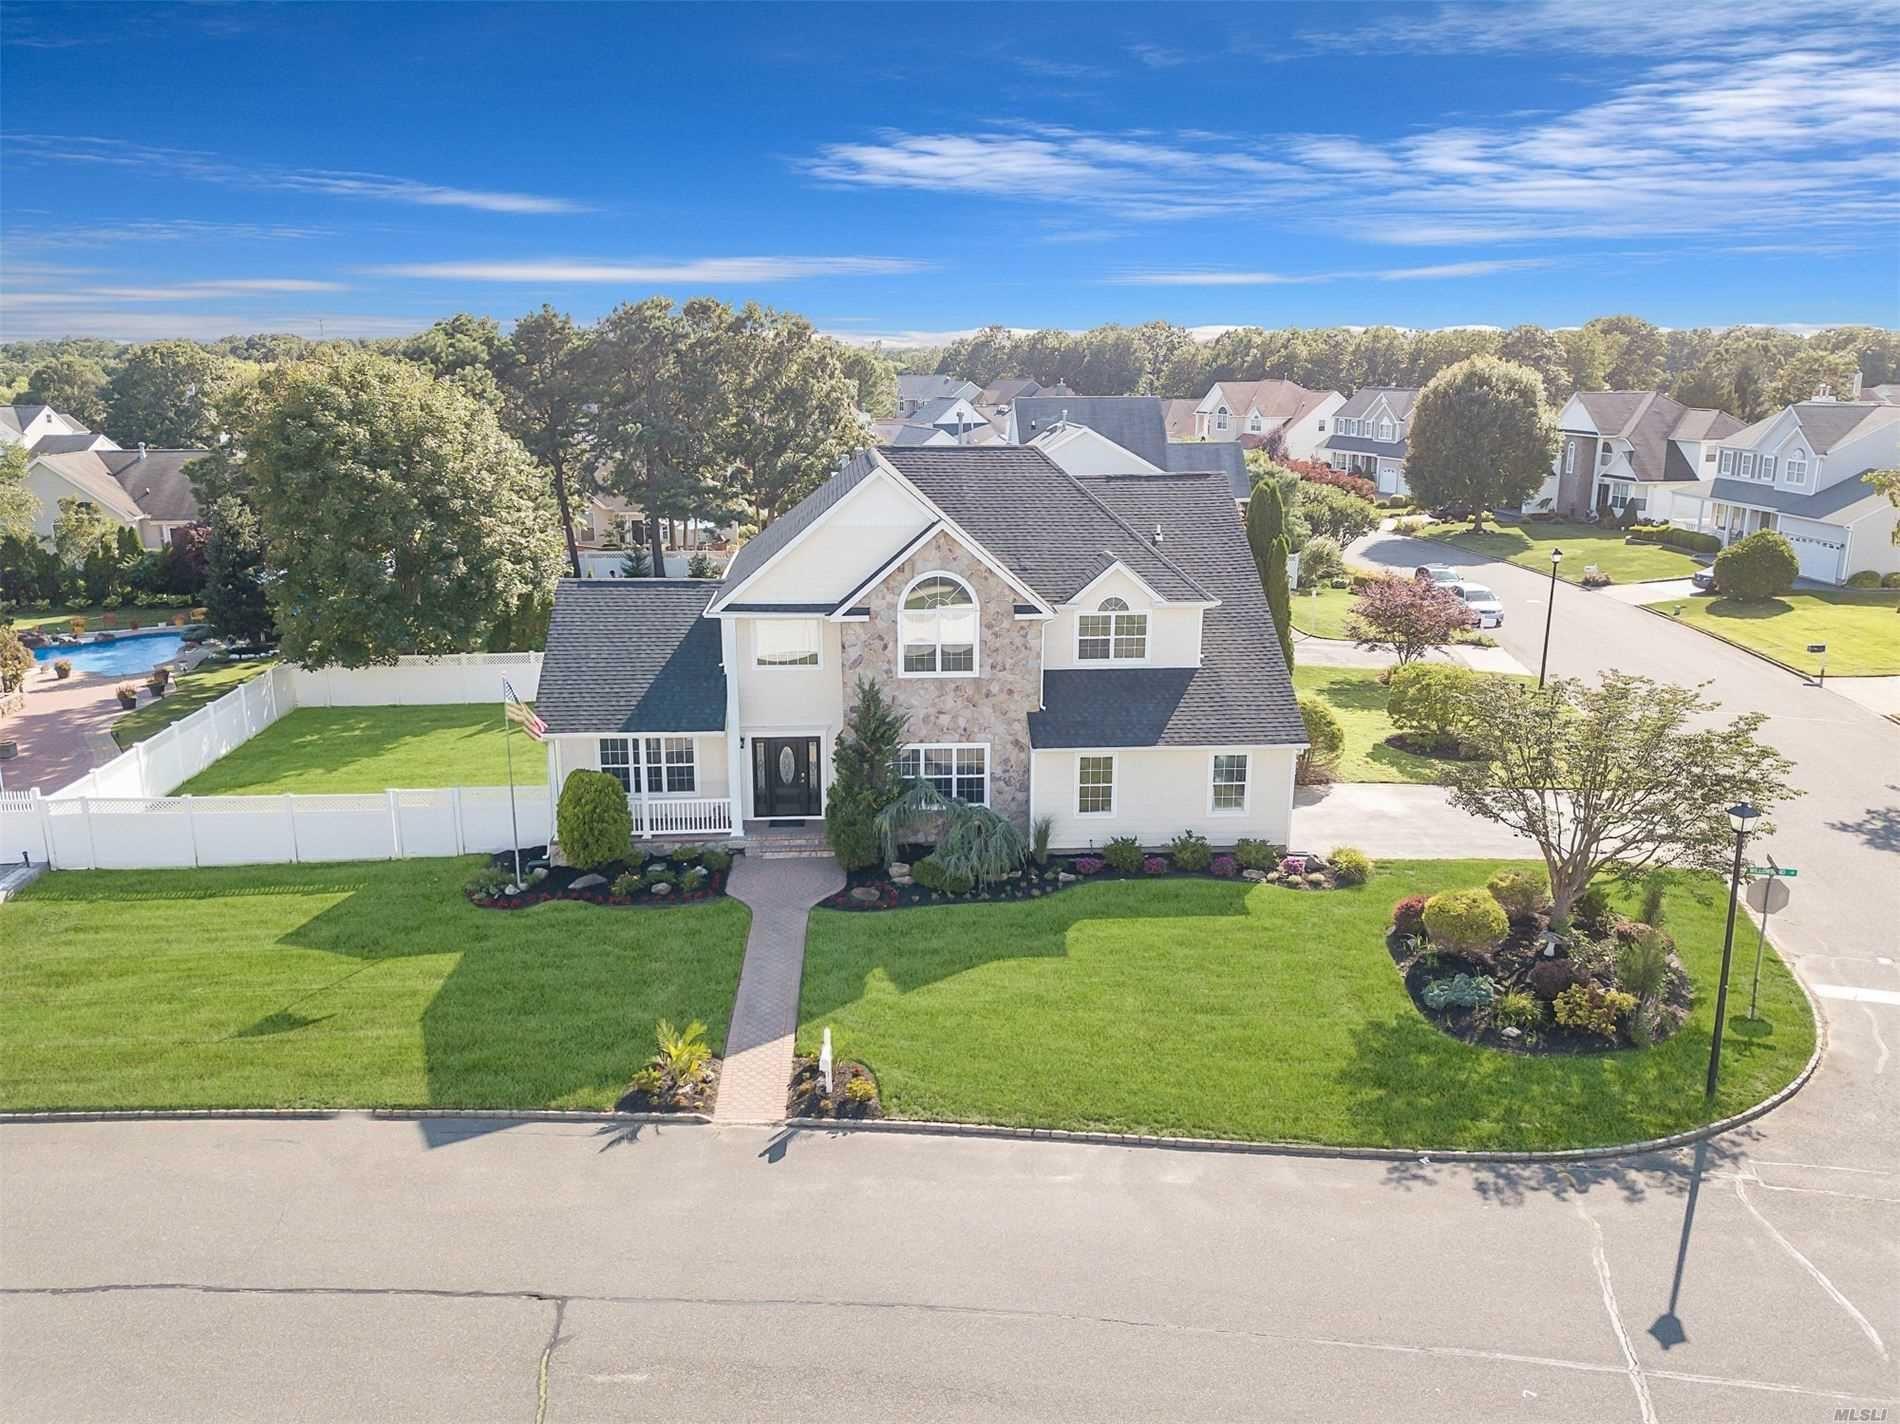 31 Willowbend Lane, Holtsville, NY 11742 - MLS#: 3241855